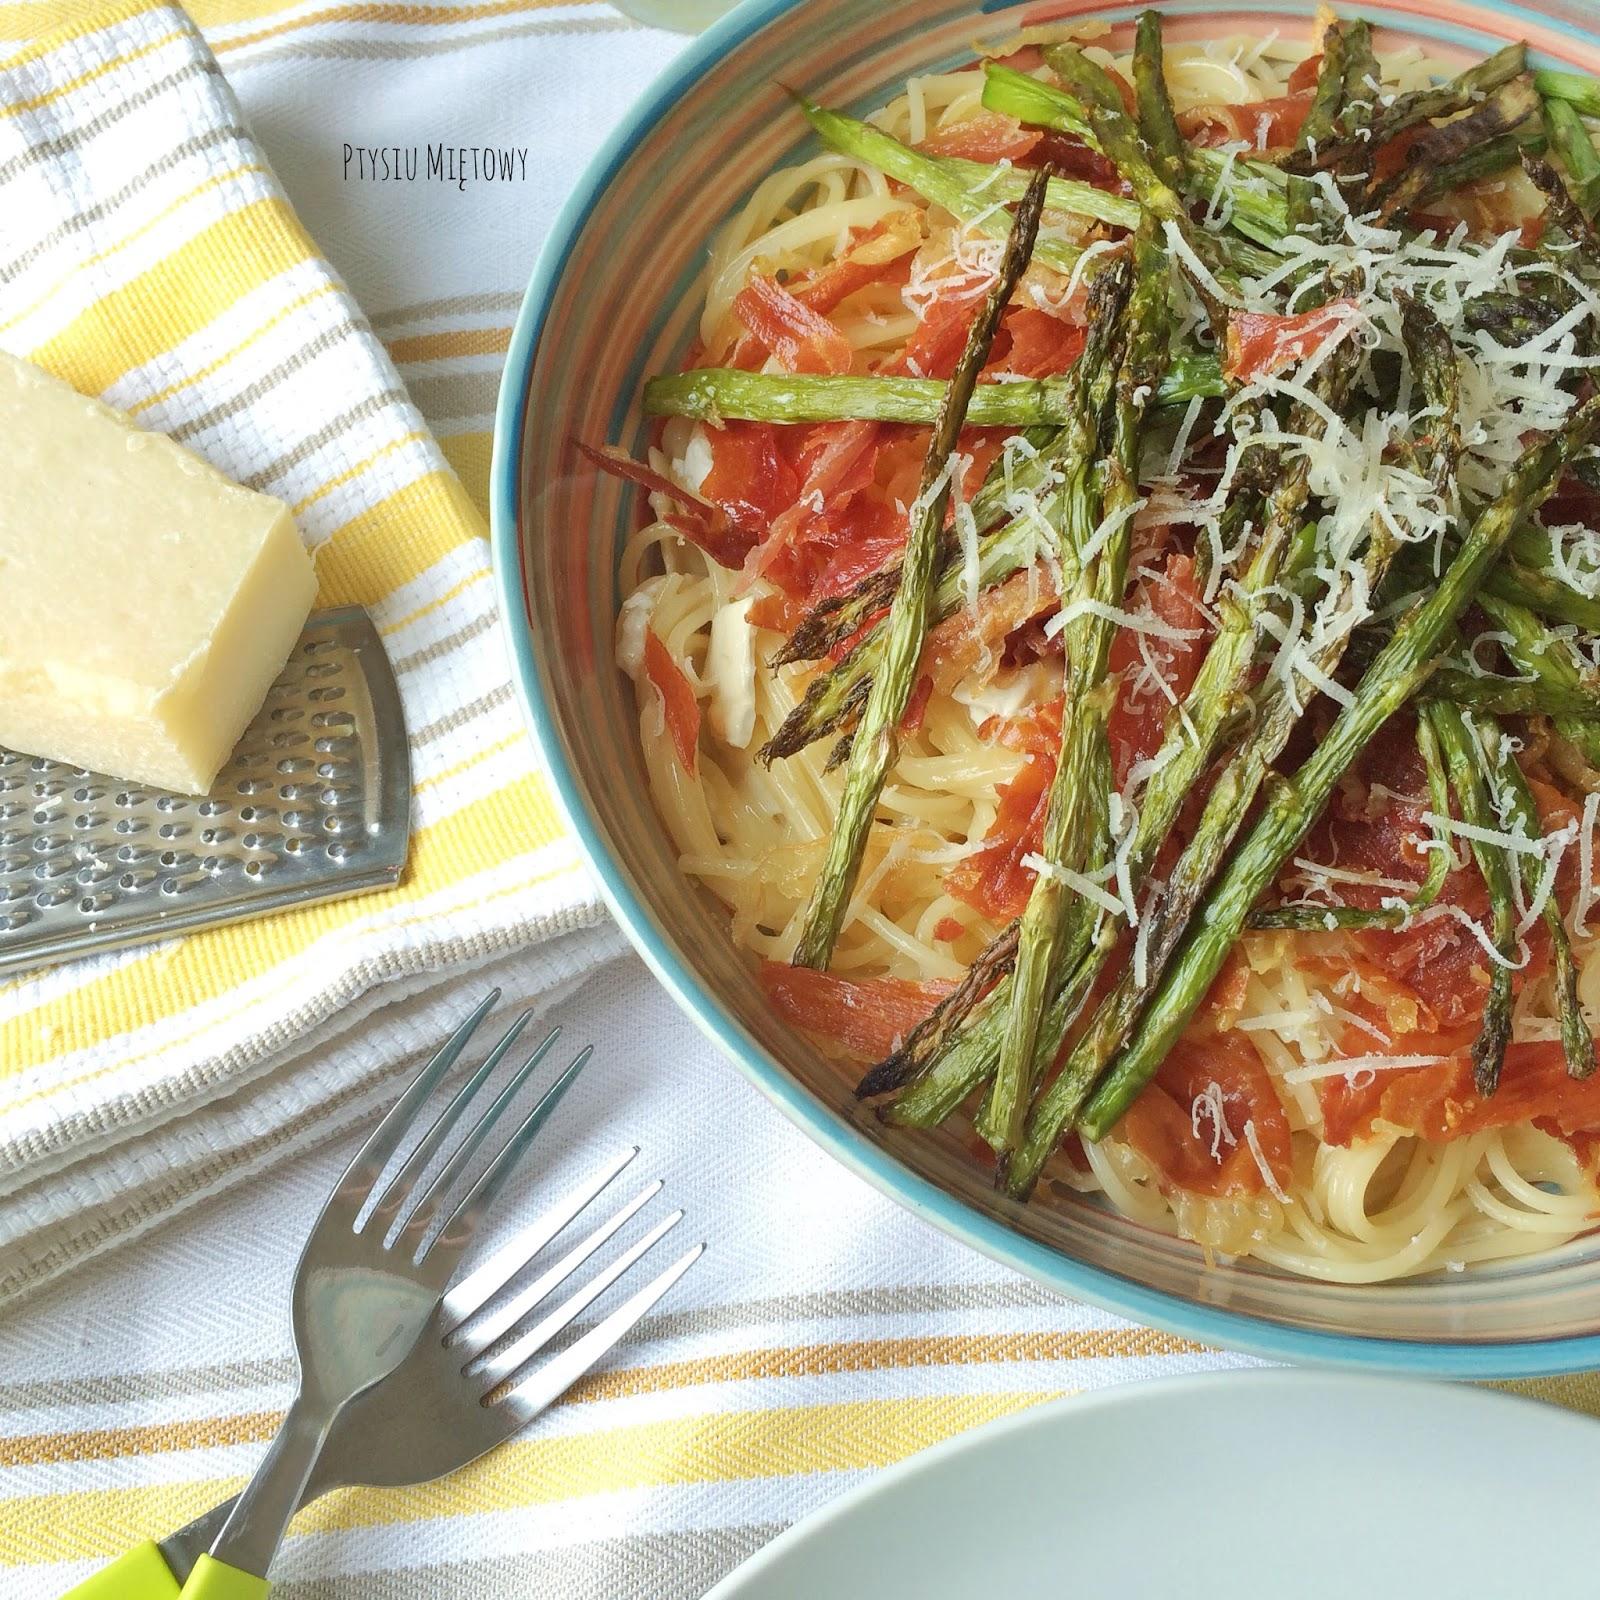 spaghetti, szparagi, kozi ser, szynka parmenska, ptysiu miętowy